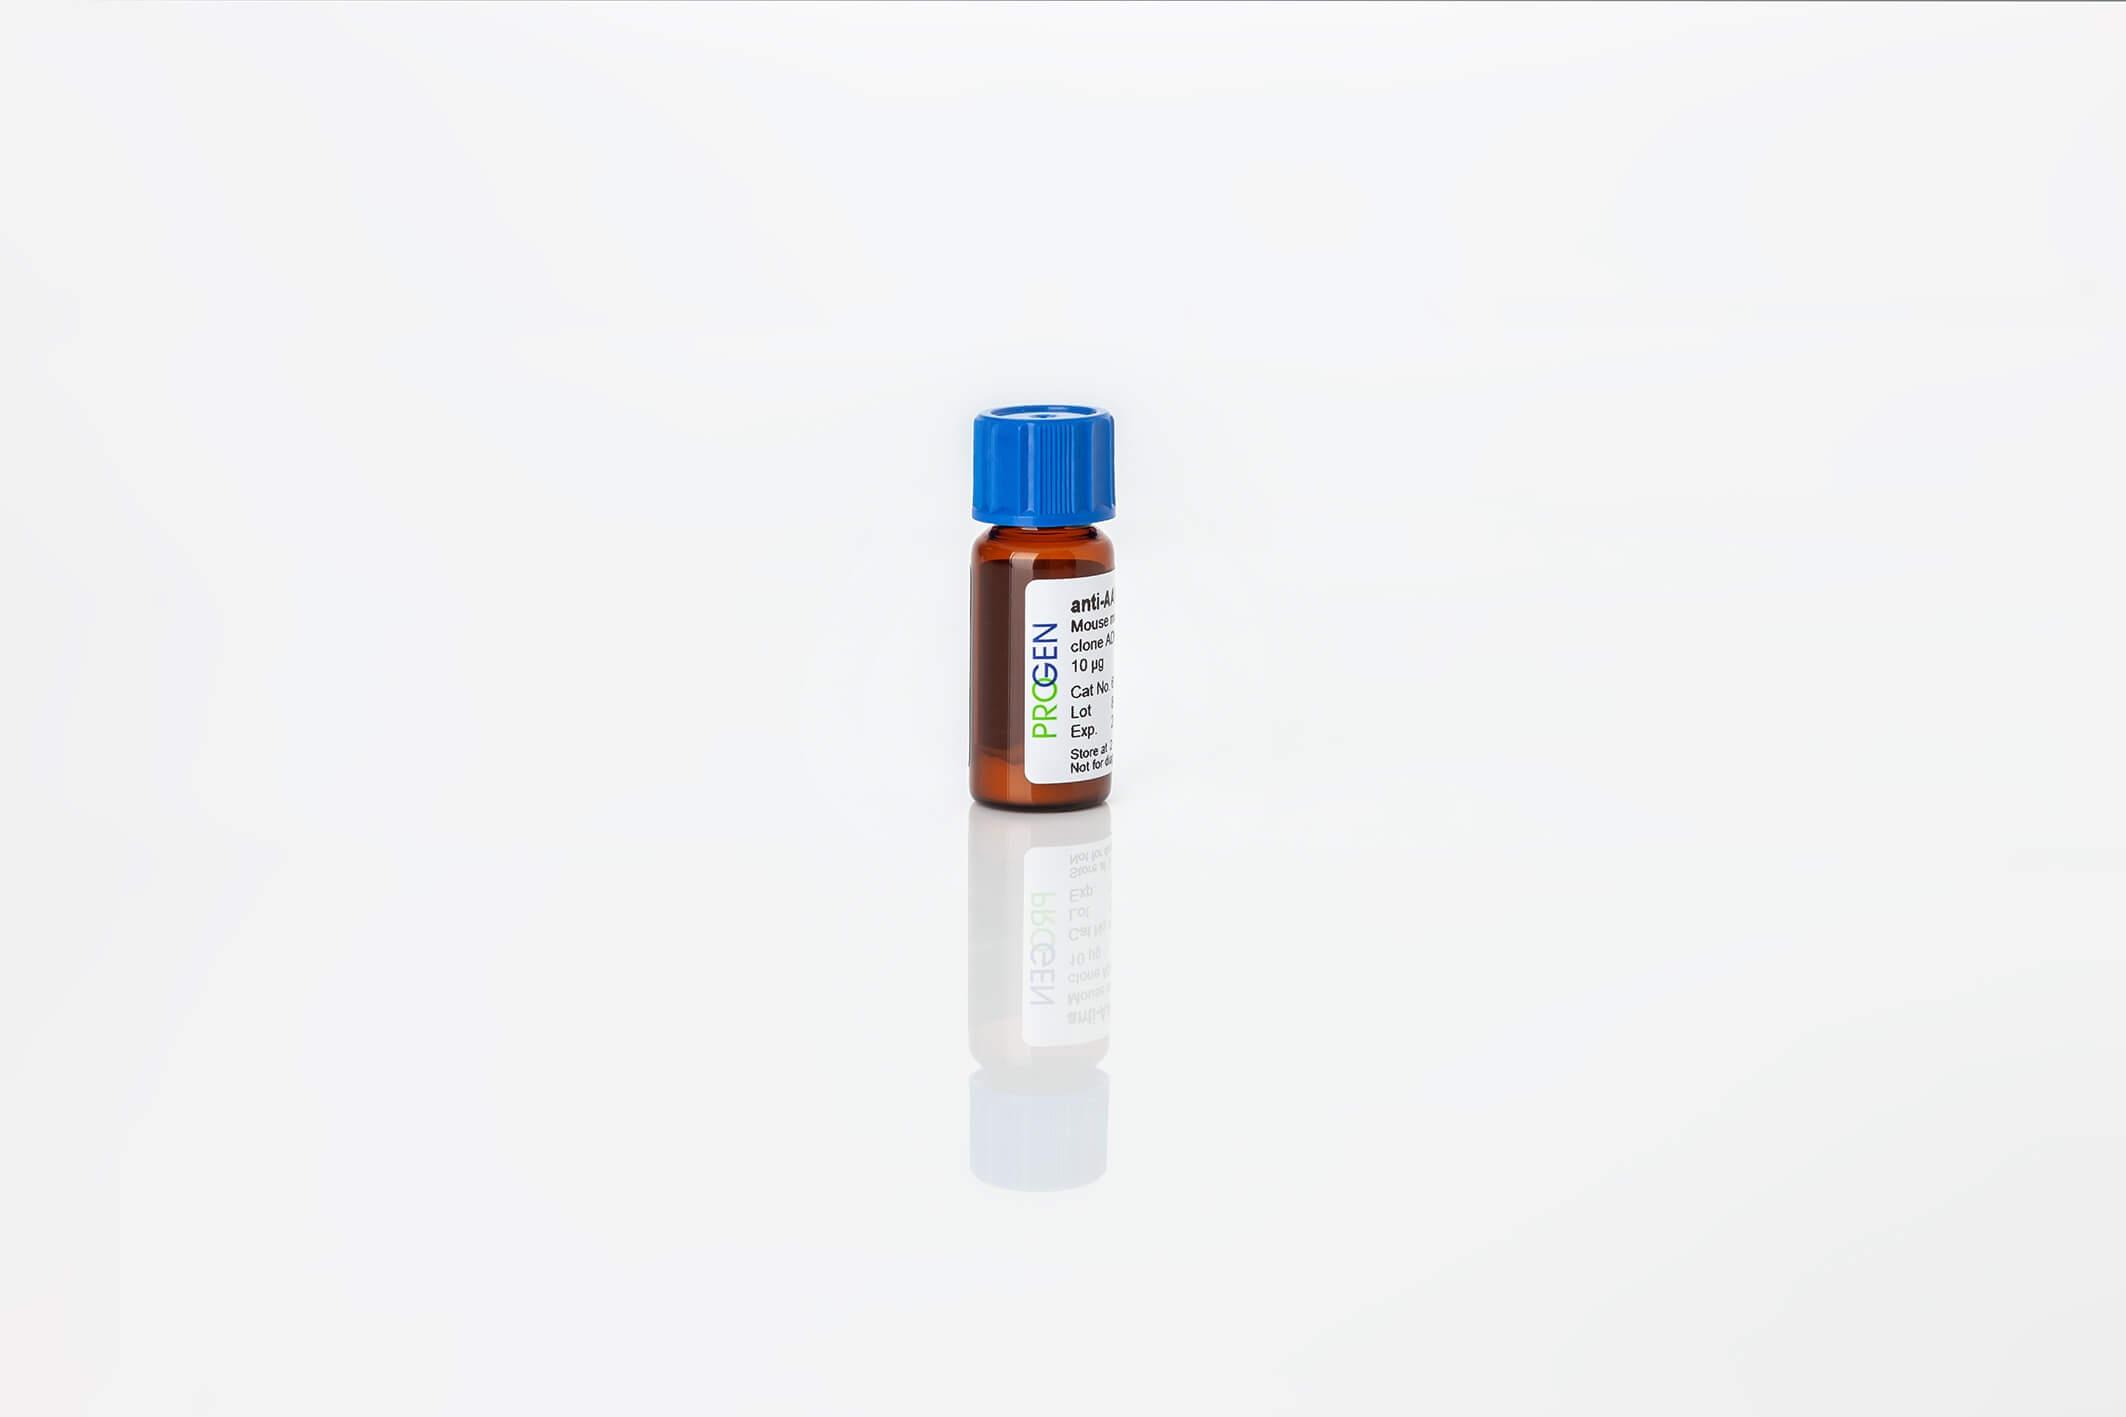 anti-Cyclin D1 mouse monoclonal, DCS-6, liquid, purified, small